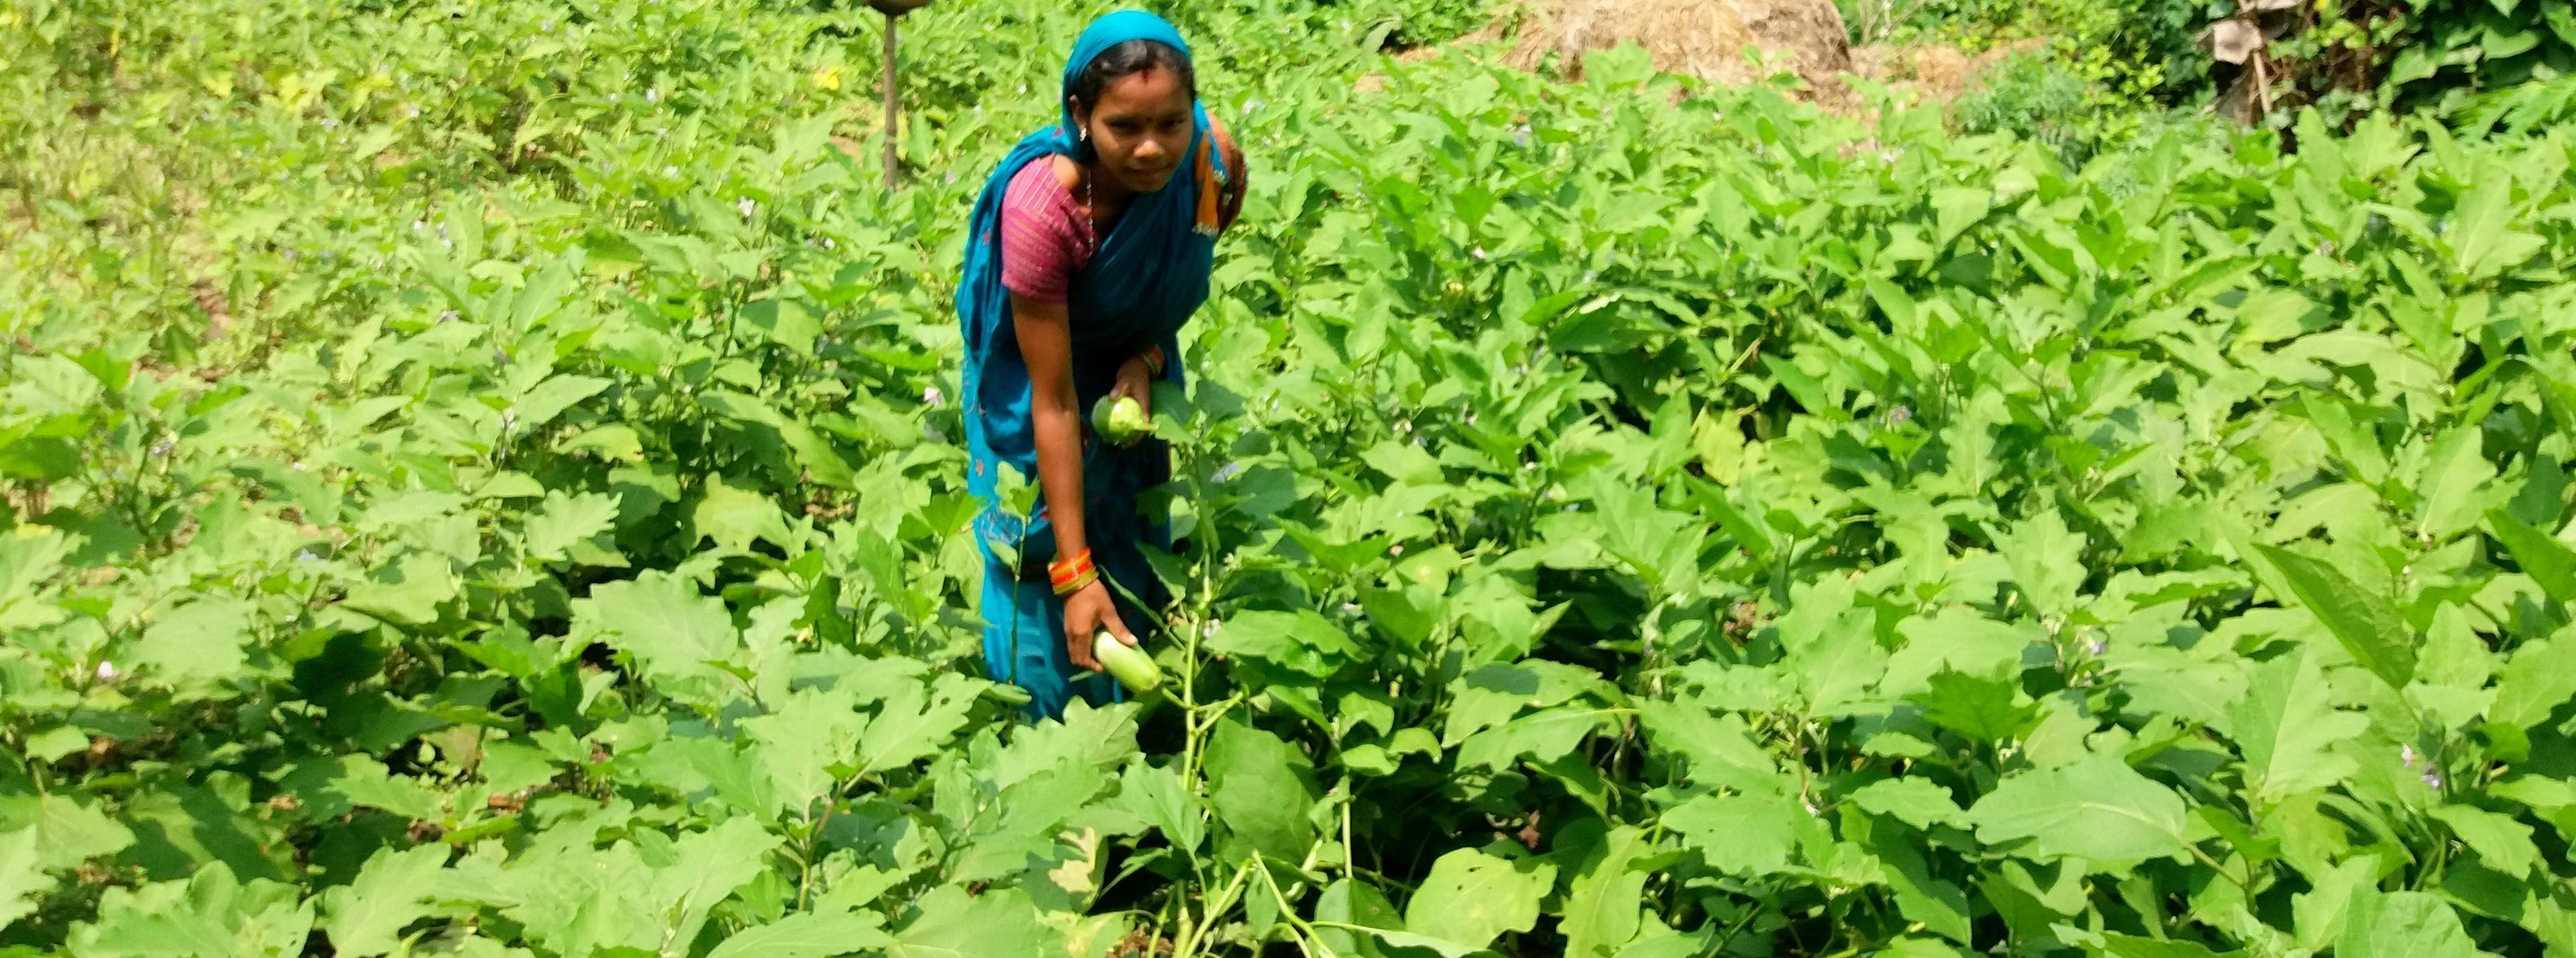 Promoting Nutritional Garden